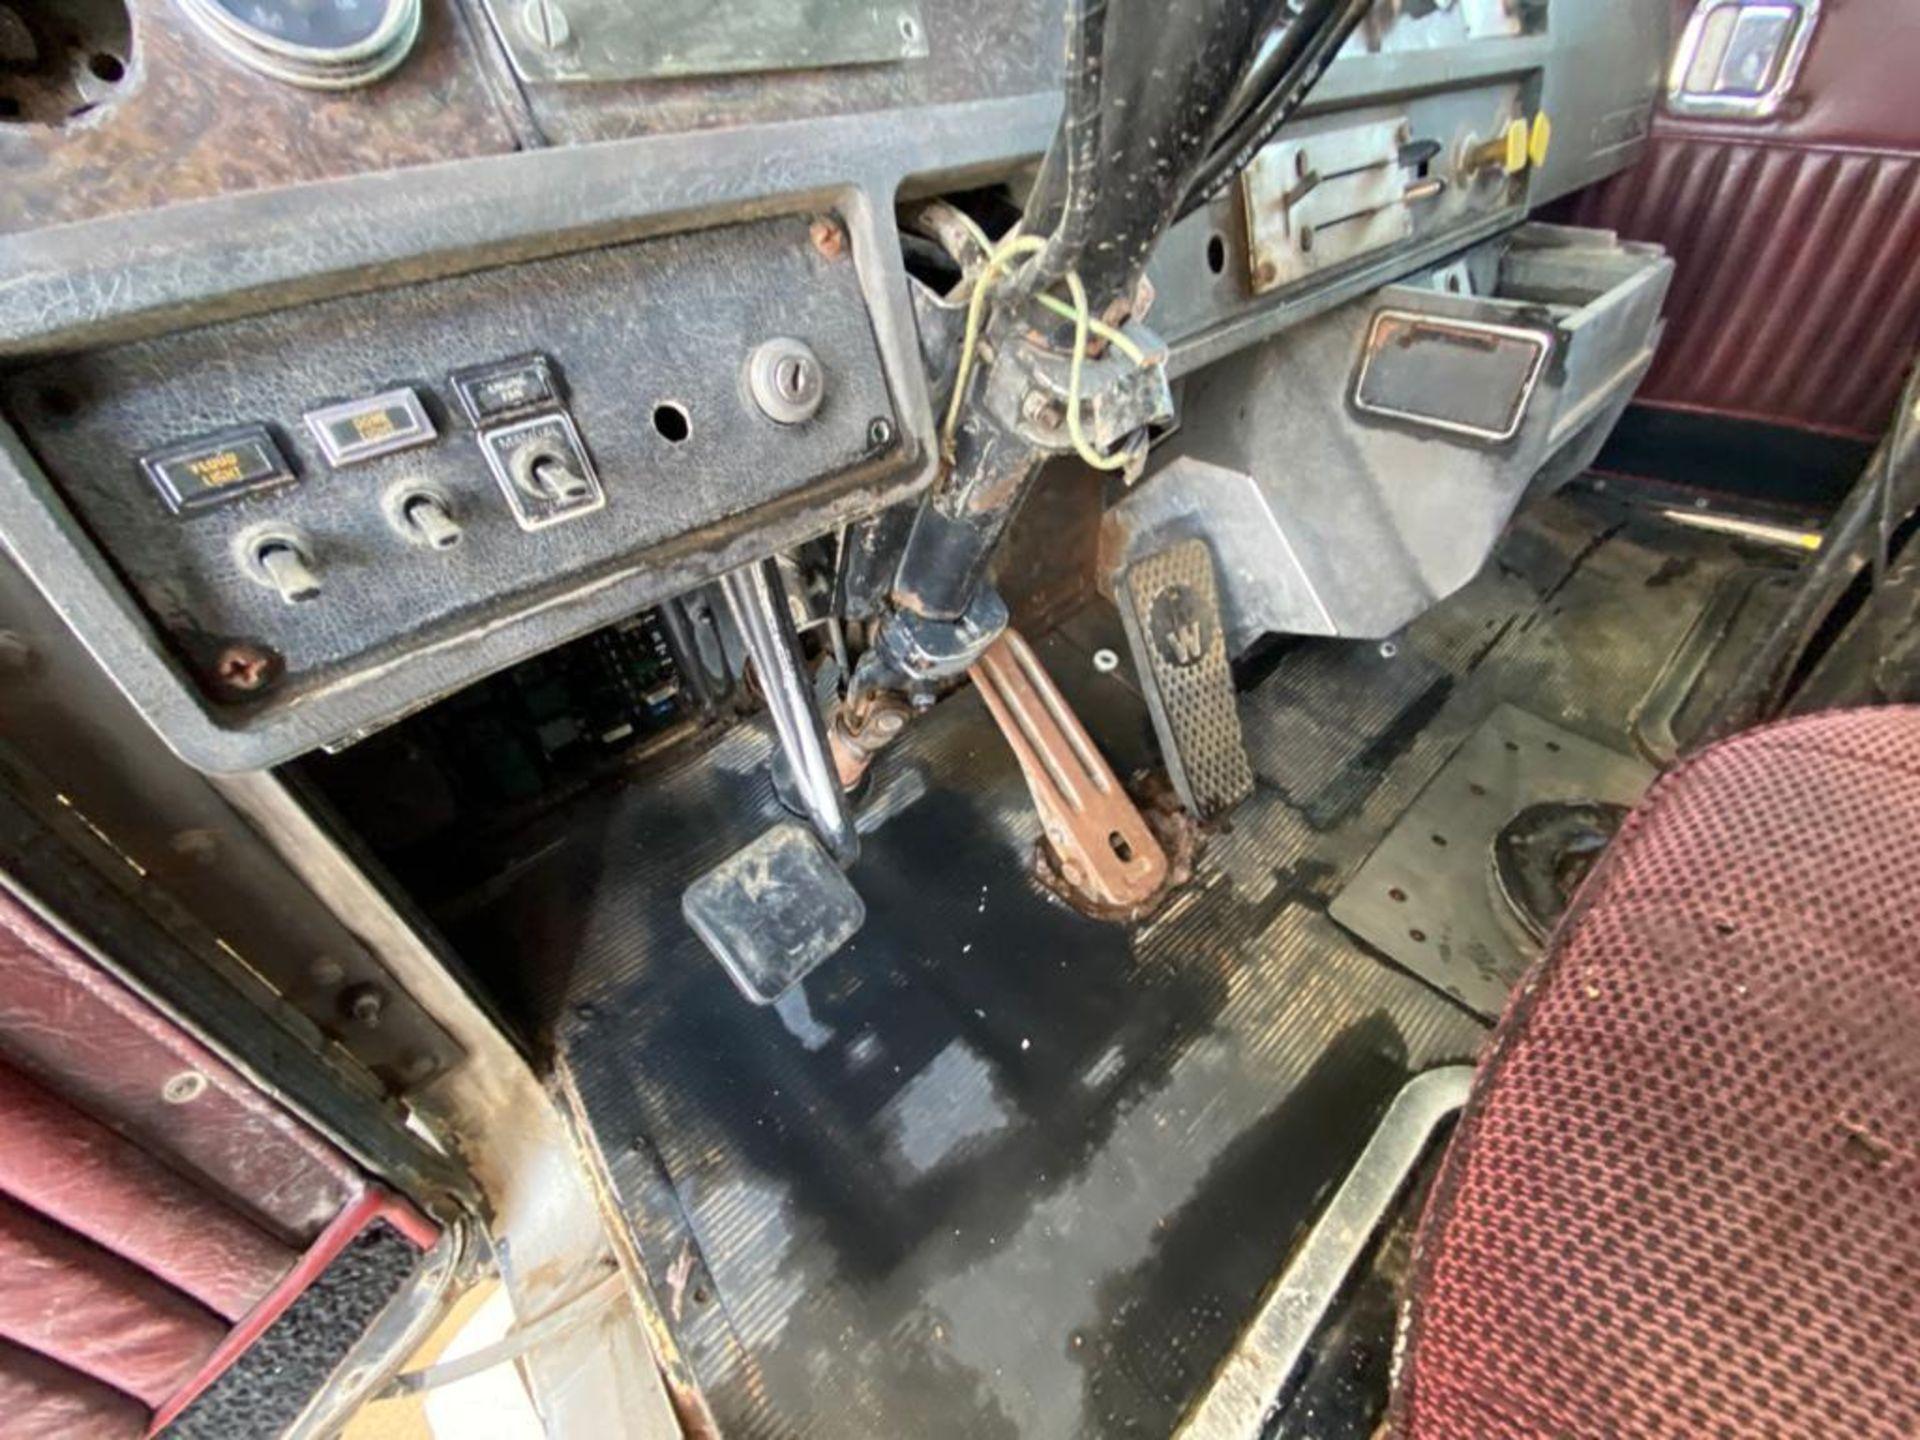 1983 Kenworth Dump Truck, standard transmission of 10 speeds, with Cummins motor - Image 30 of 68